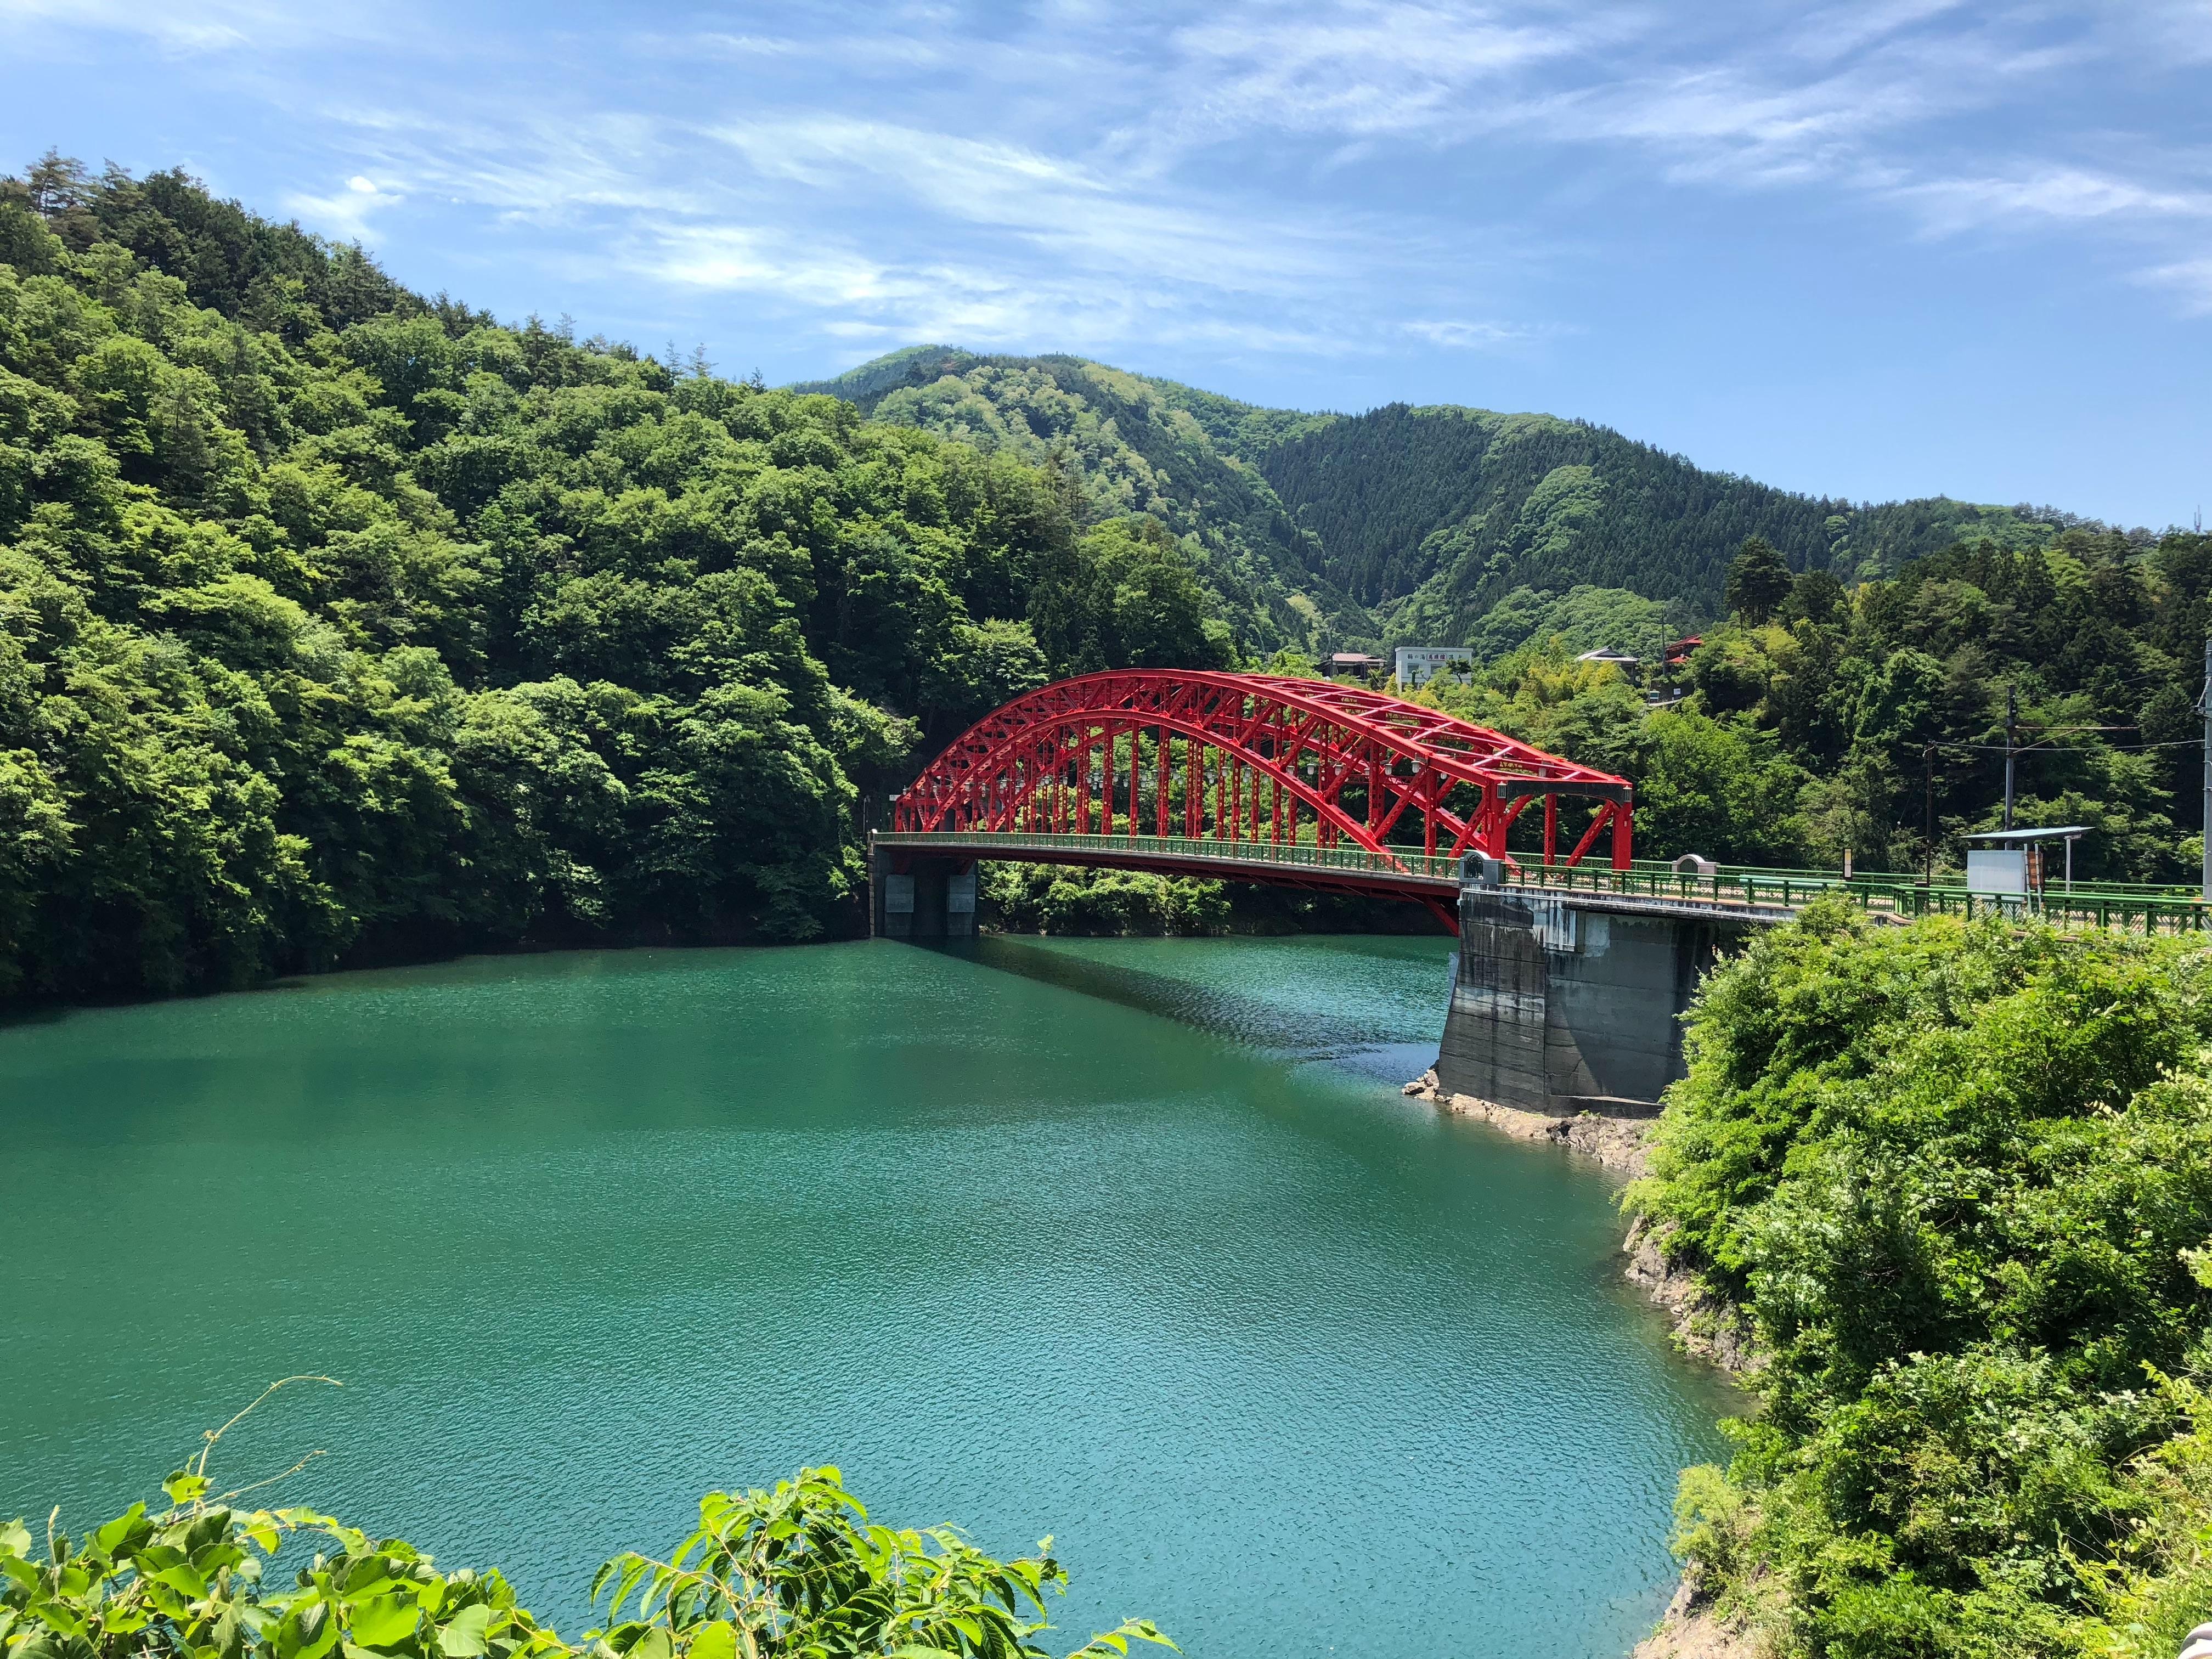 f:id:yanakahachisuke:20180525010742j:image